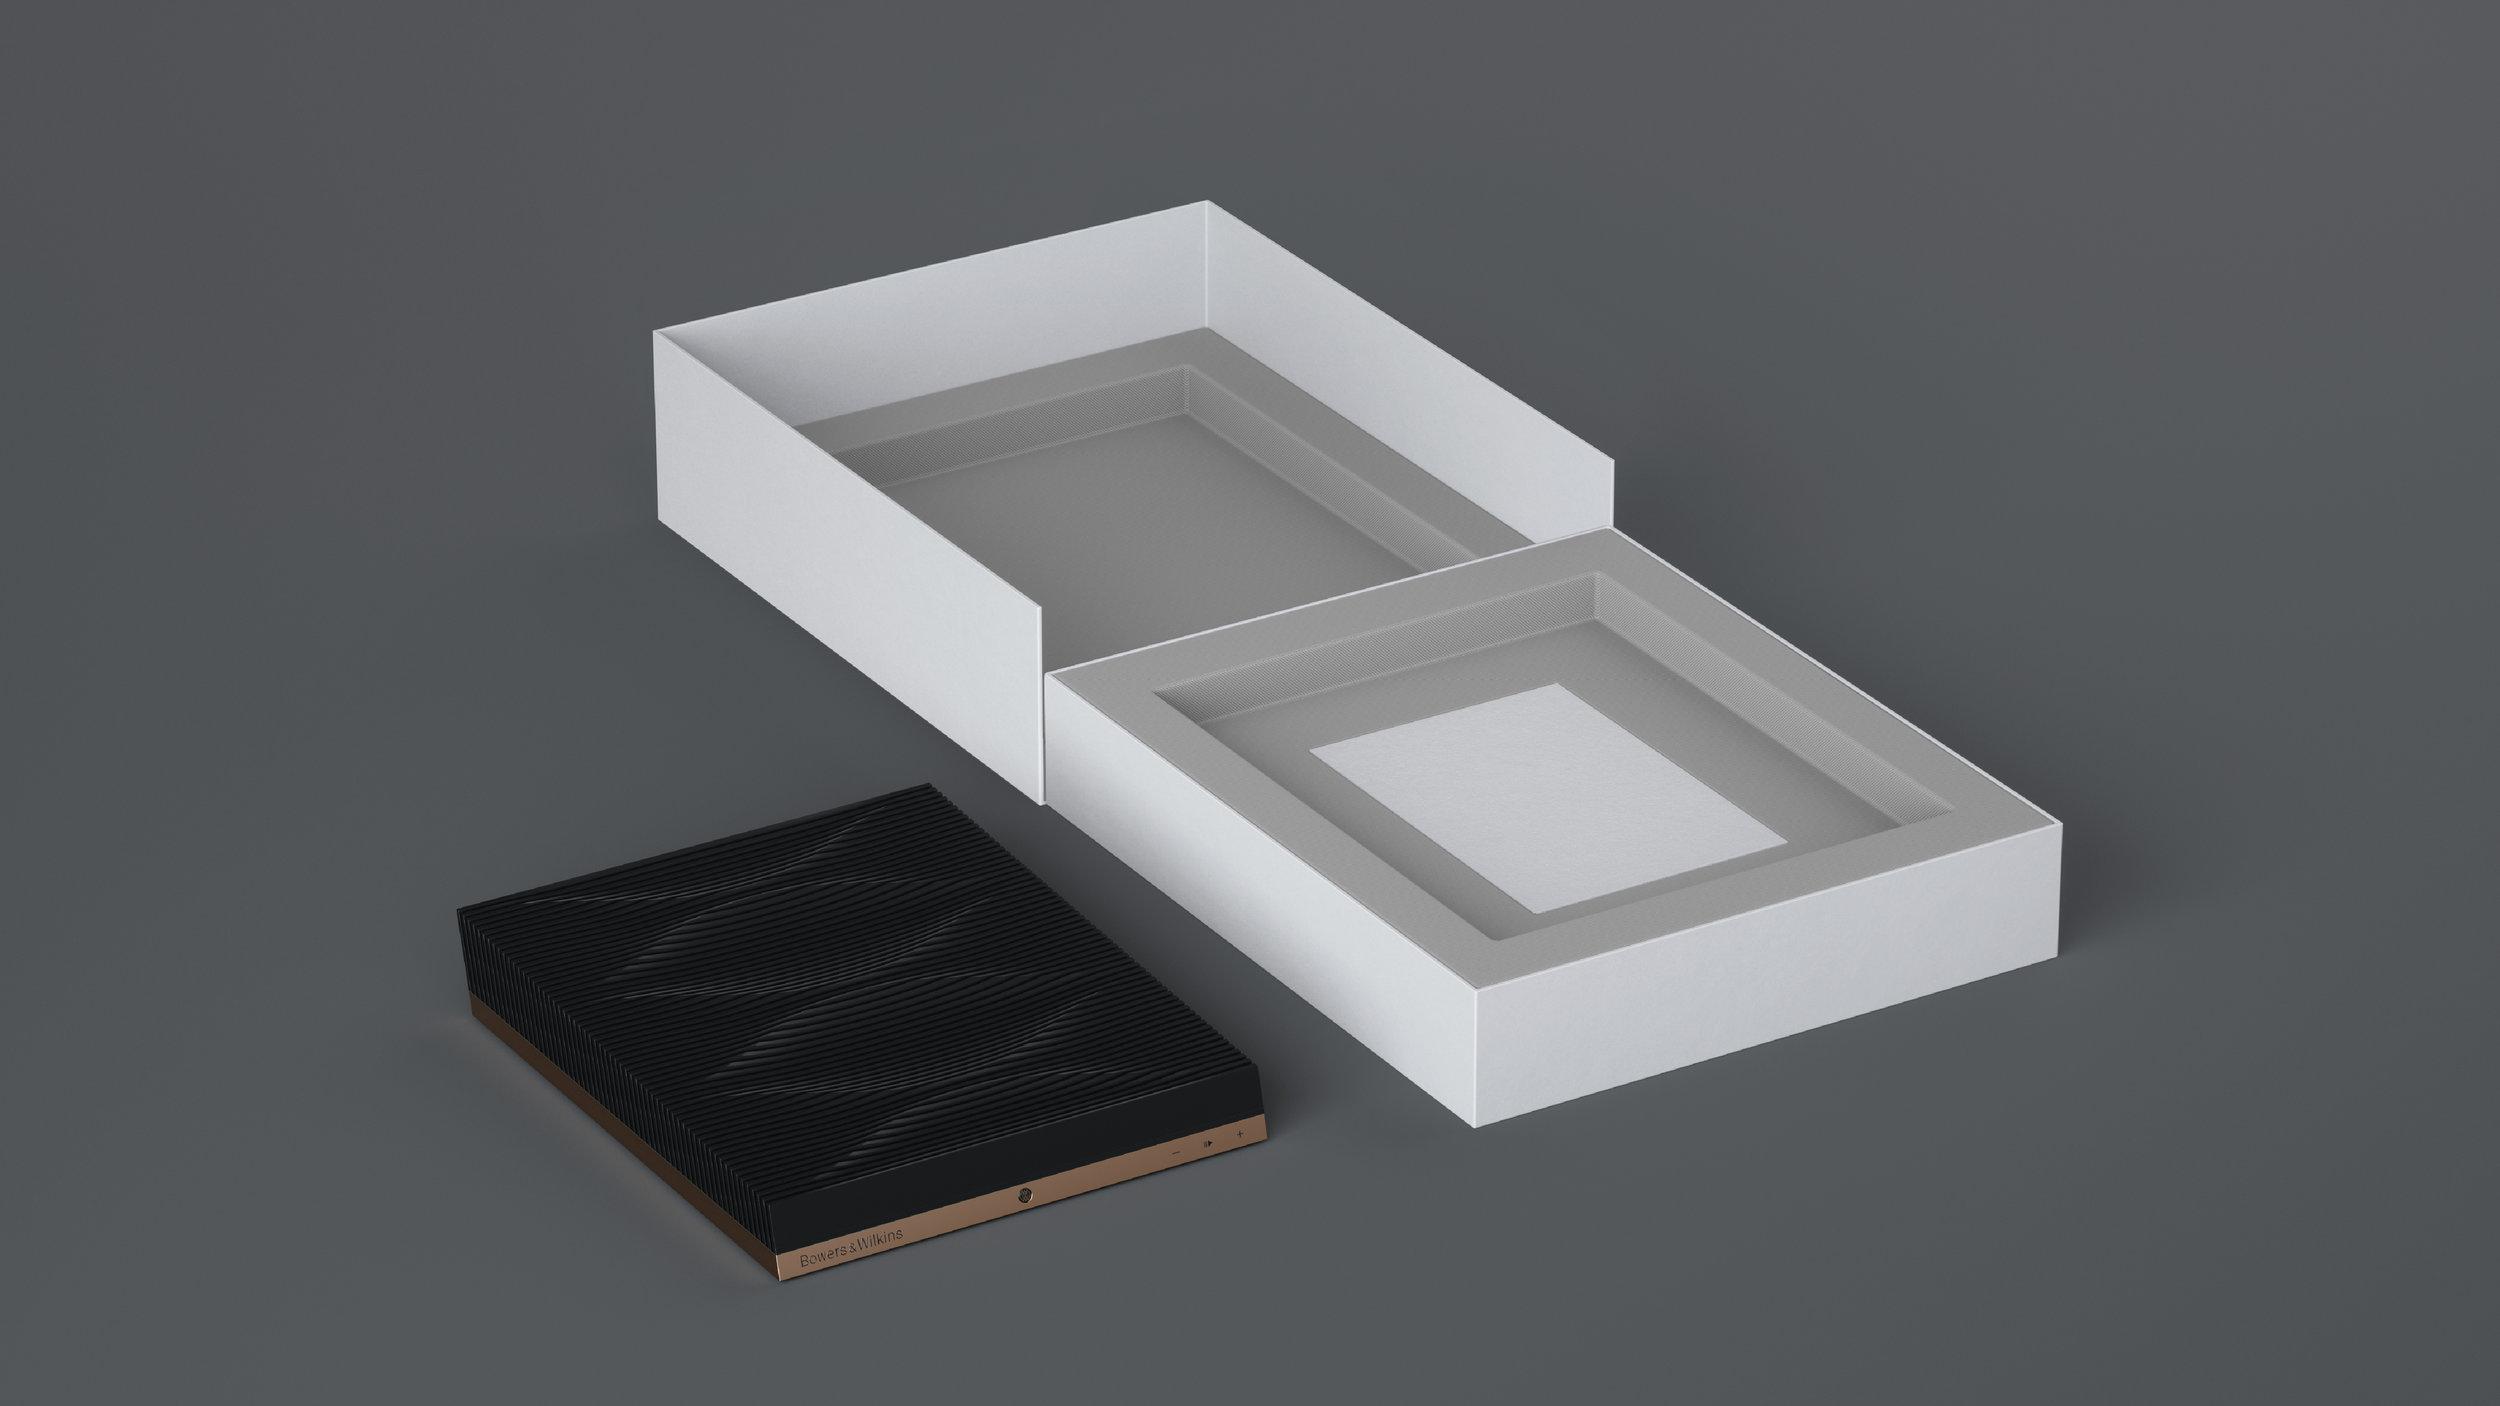 B&W_LibertySuite_PackagingStructure_R182.jpg